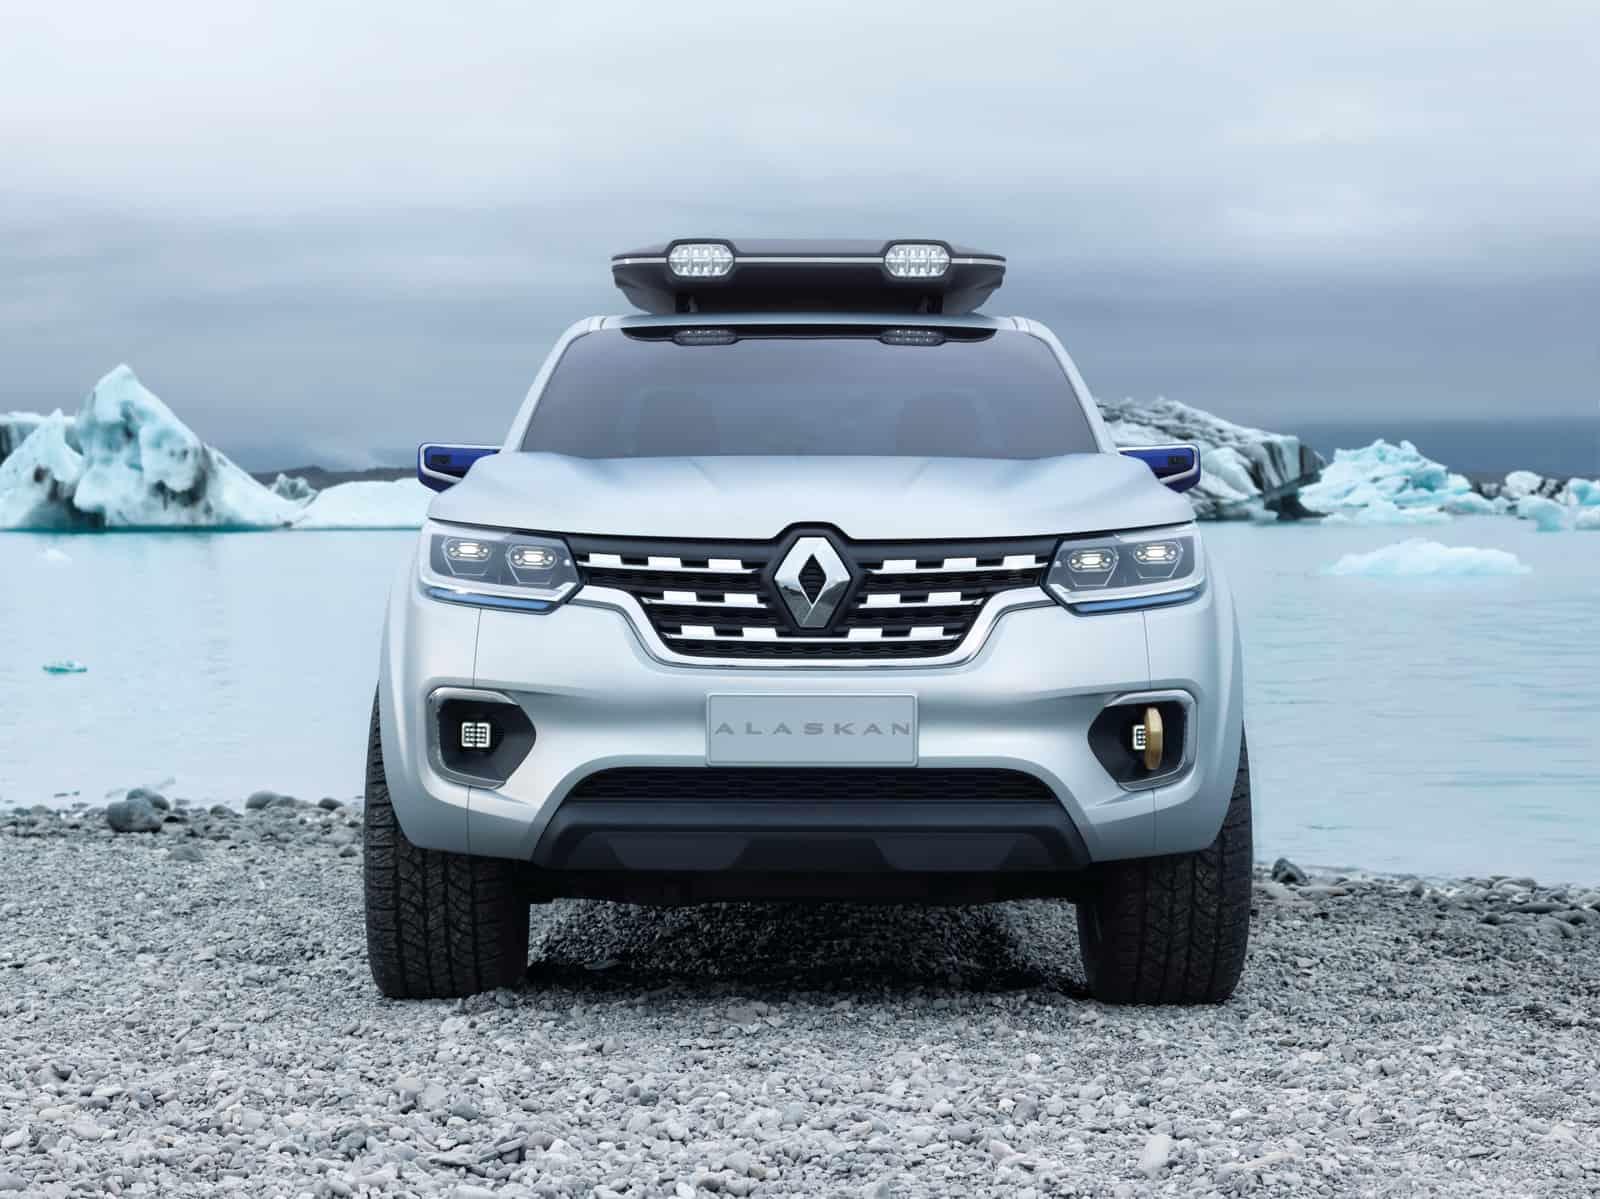 Renault-Alaskan-Concept-16